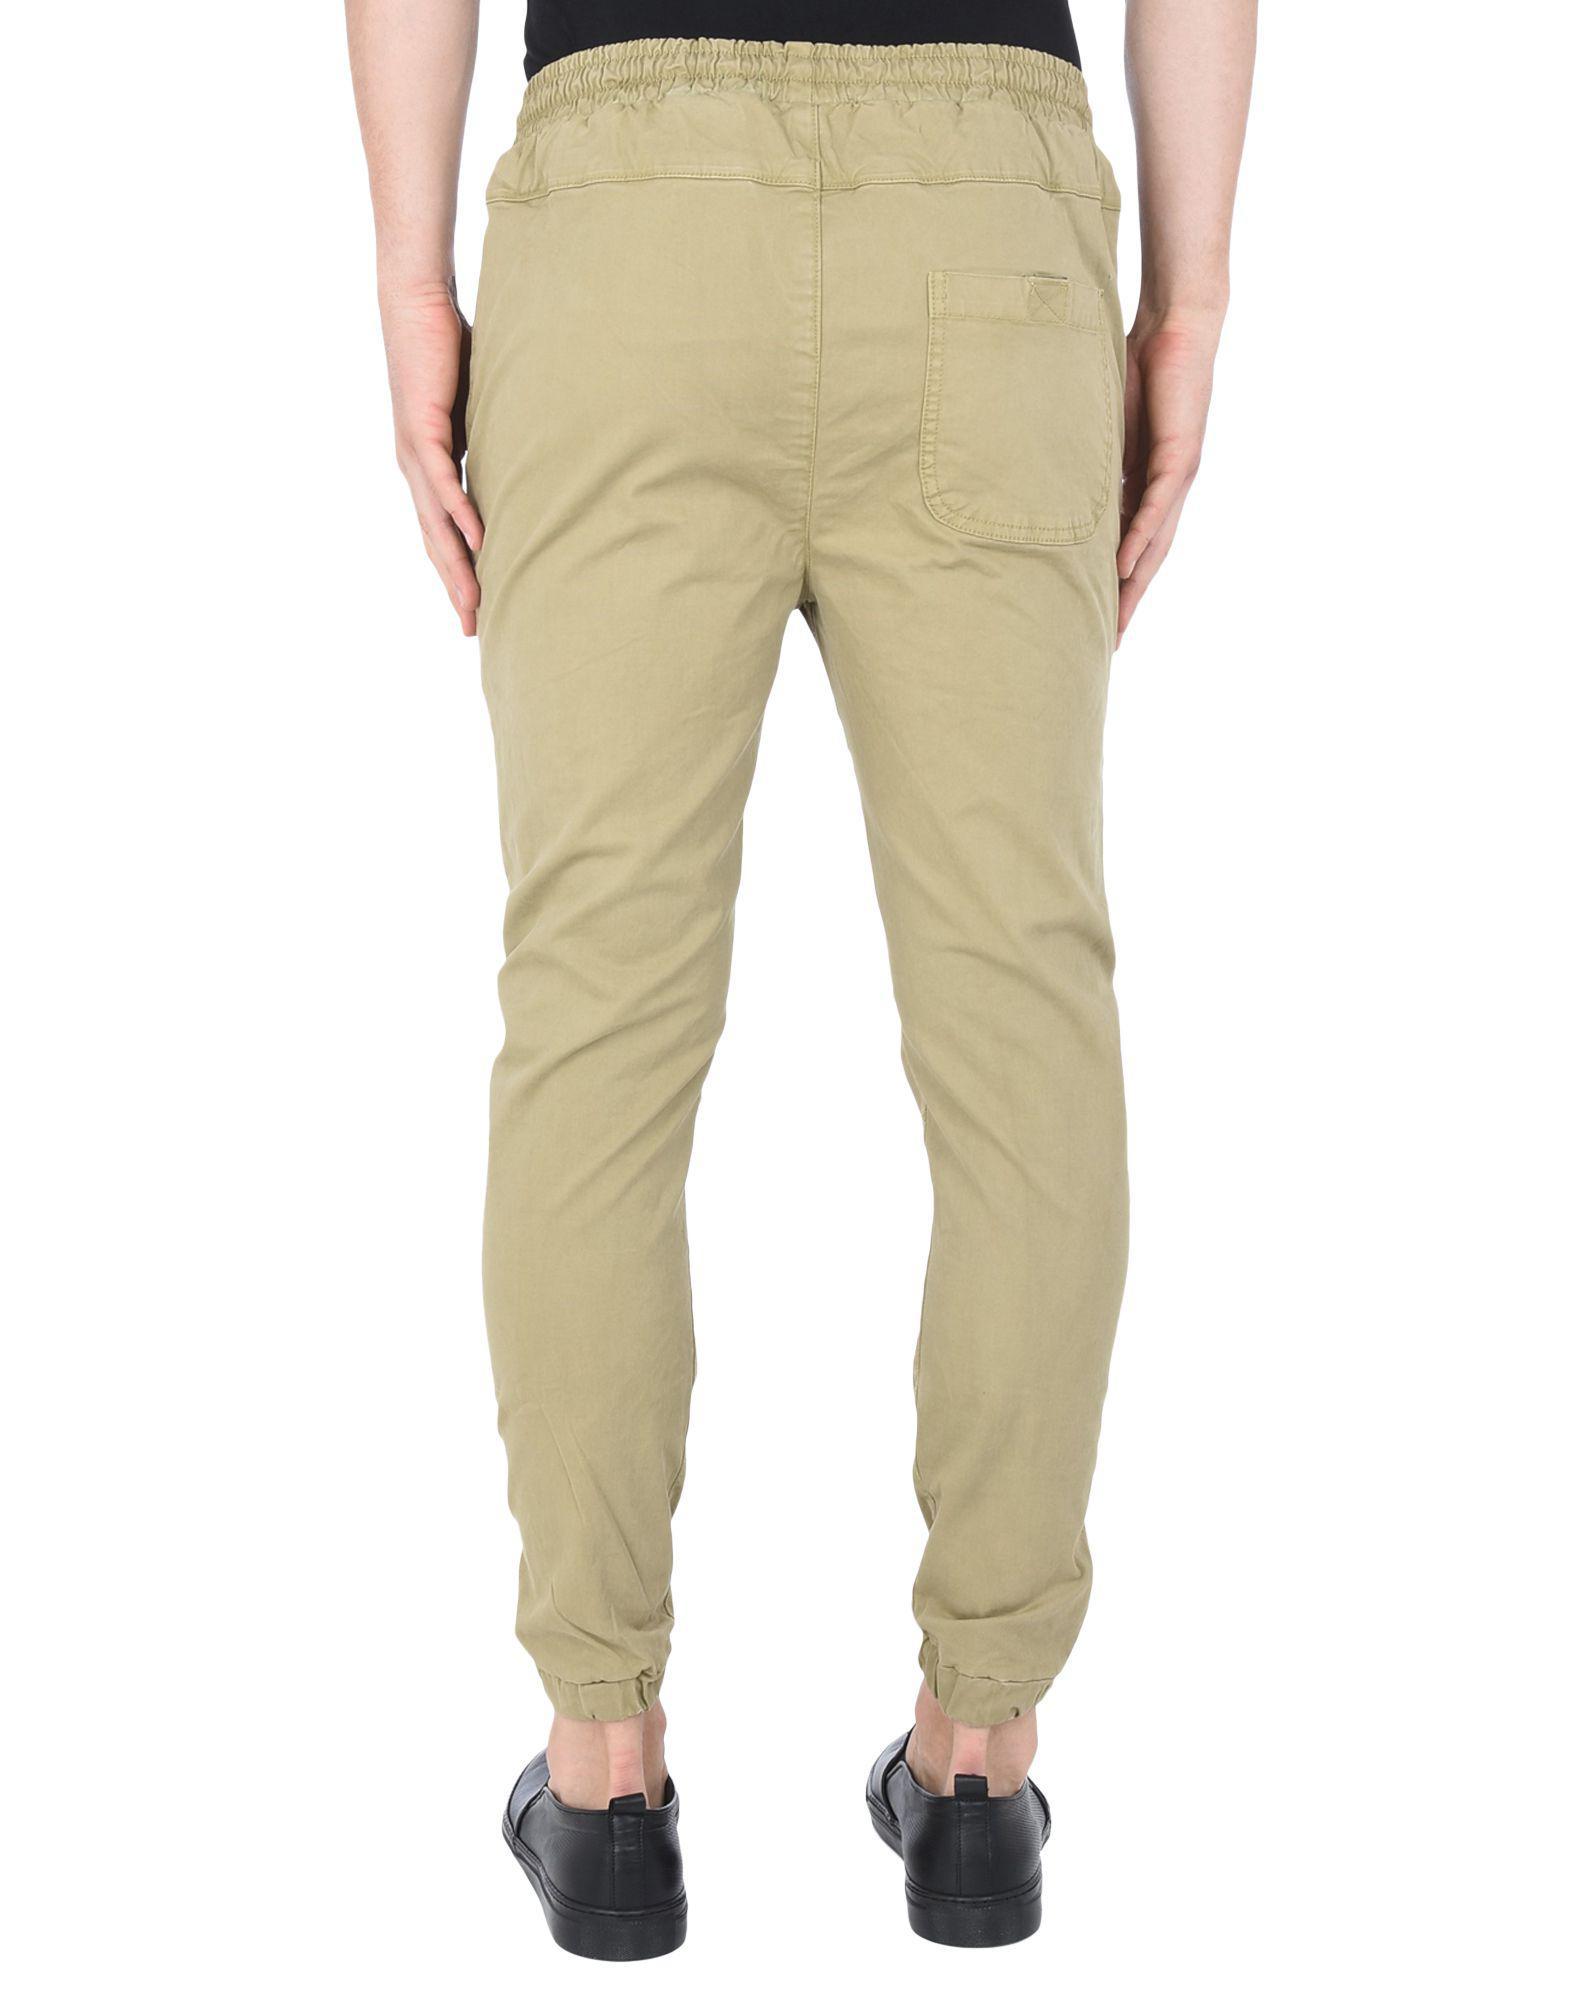 RVLT Cotton Casual Trouser in Khaki (Natural) for Men